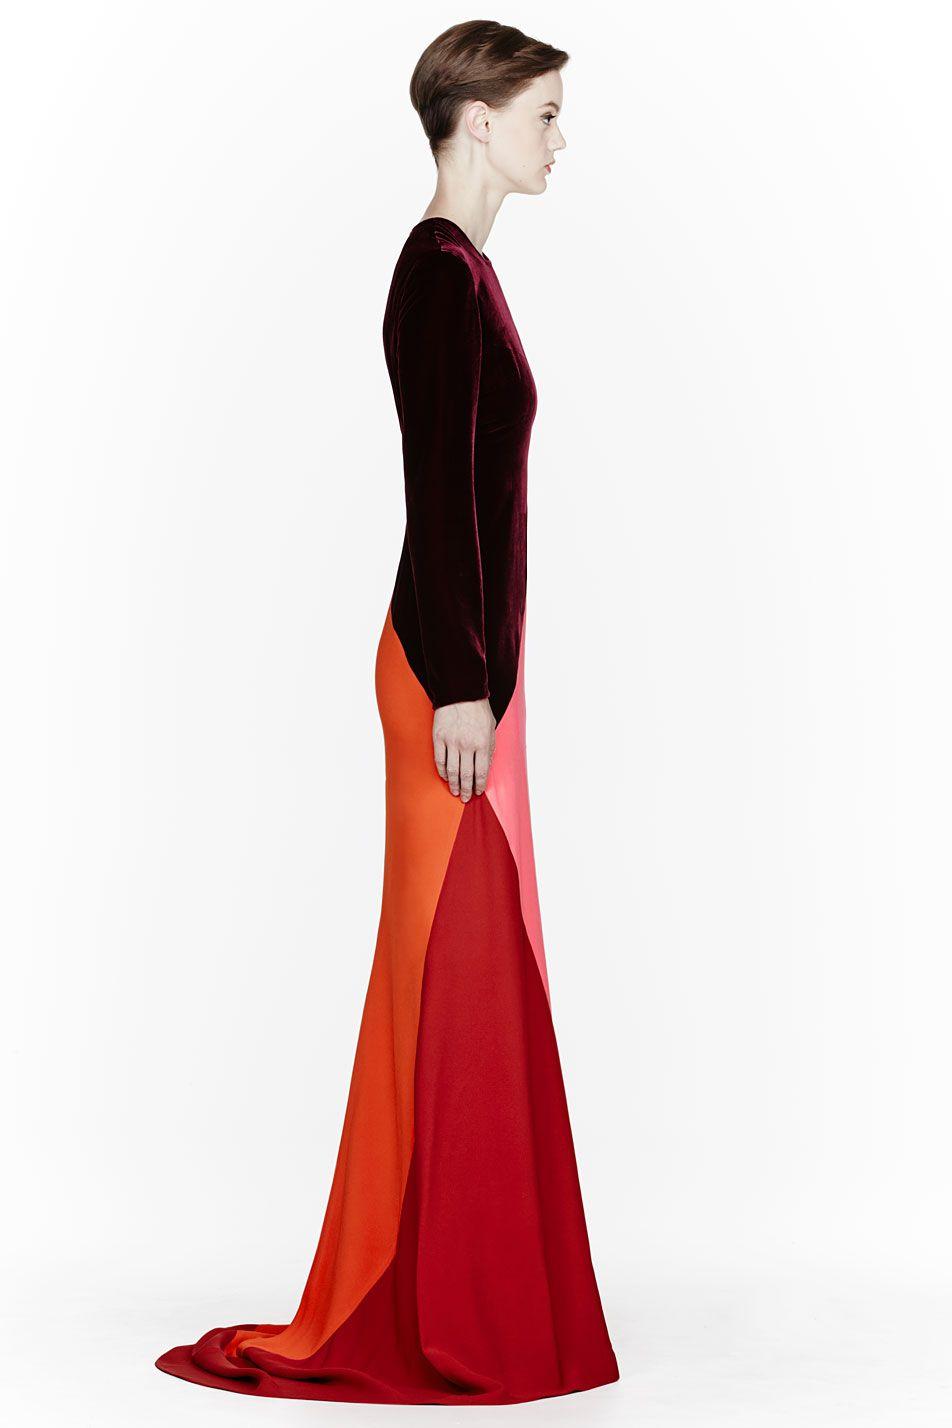 Stella mccartney colorblocked silk velvet gown dress me up